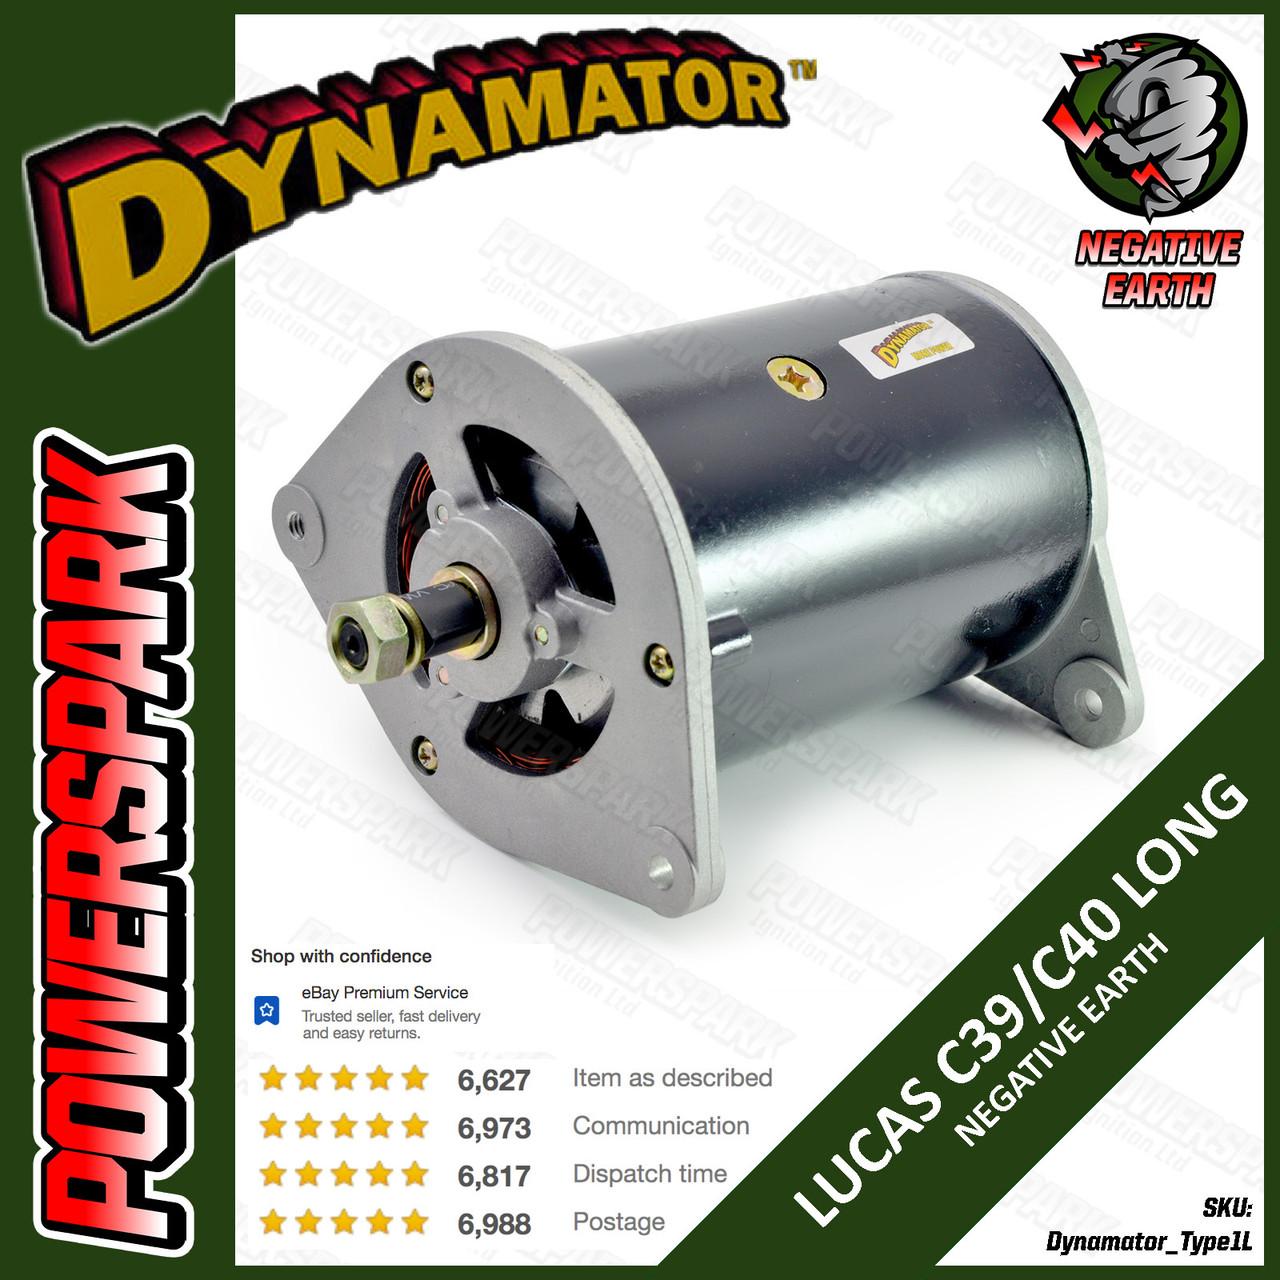 Stealth Dynamator - Dynamo to Alternator Conversion replaces Lucas C40 Long Dynamo - Neg Earth